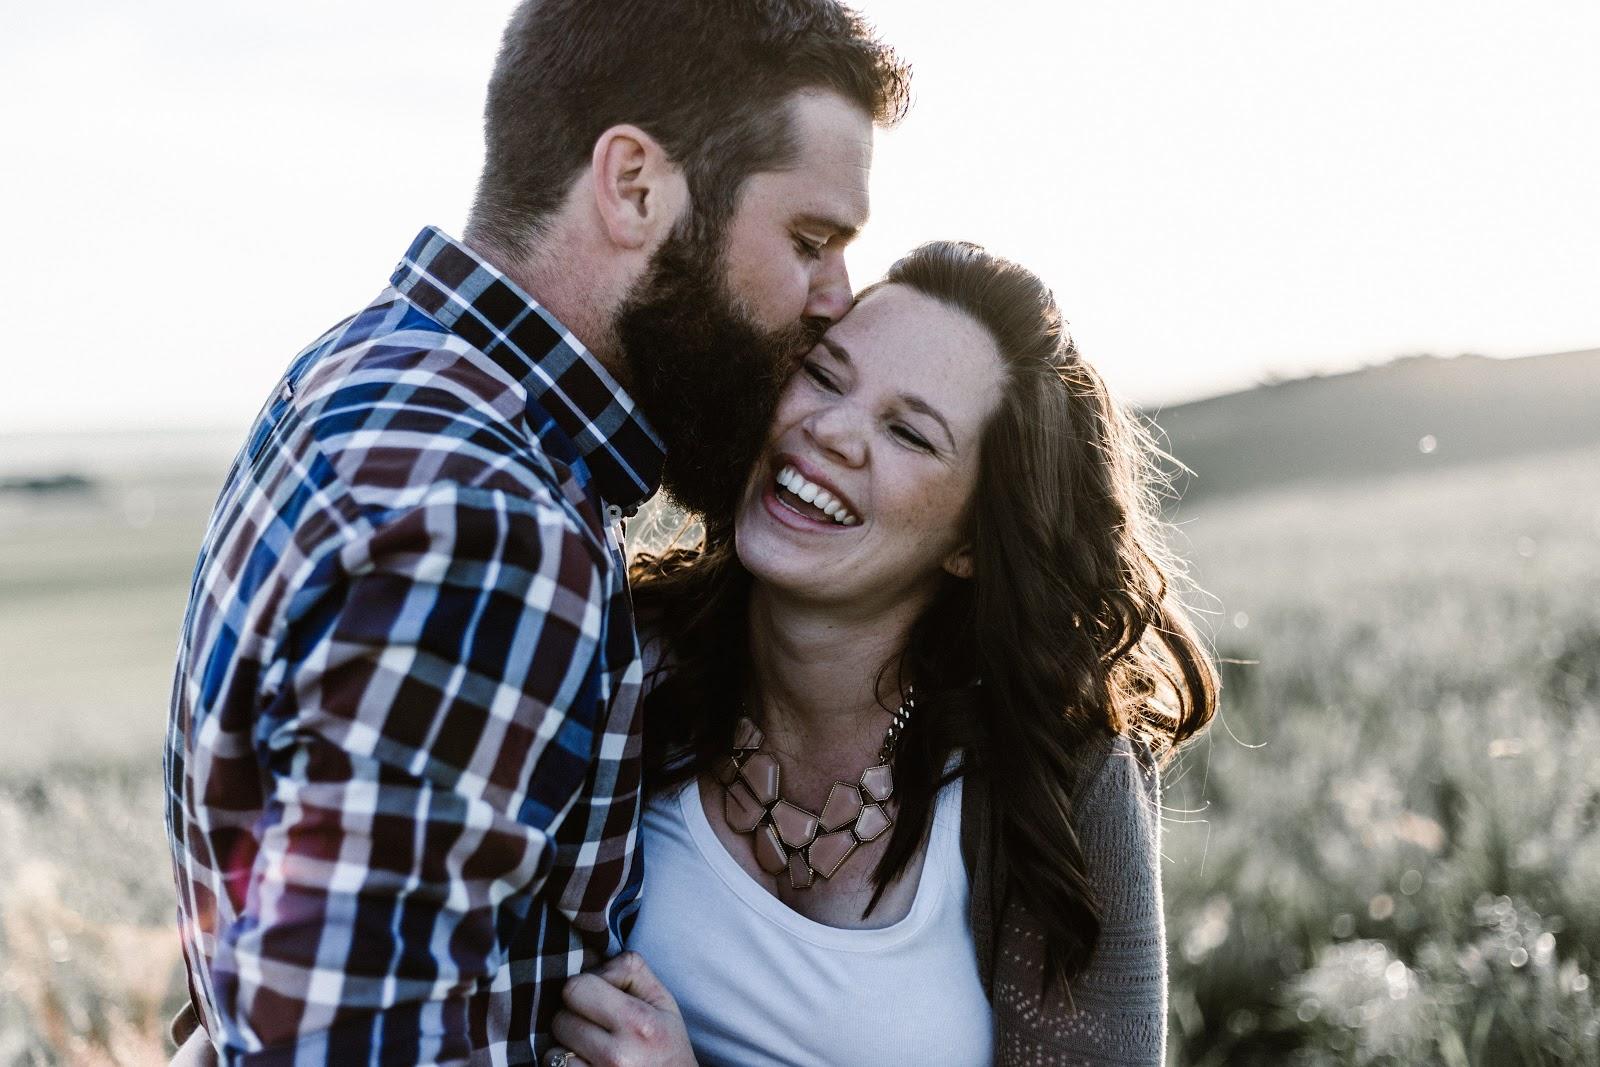 The best Enneagram 5w4 relationships (Best fit)